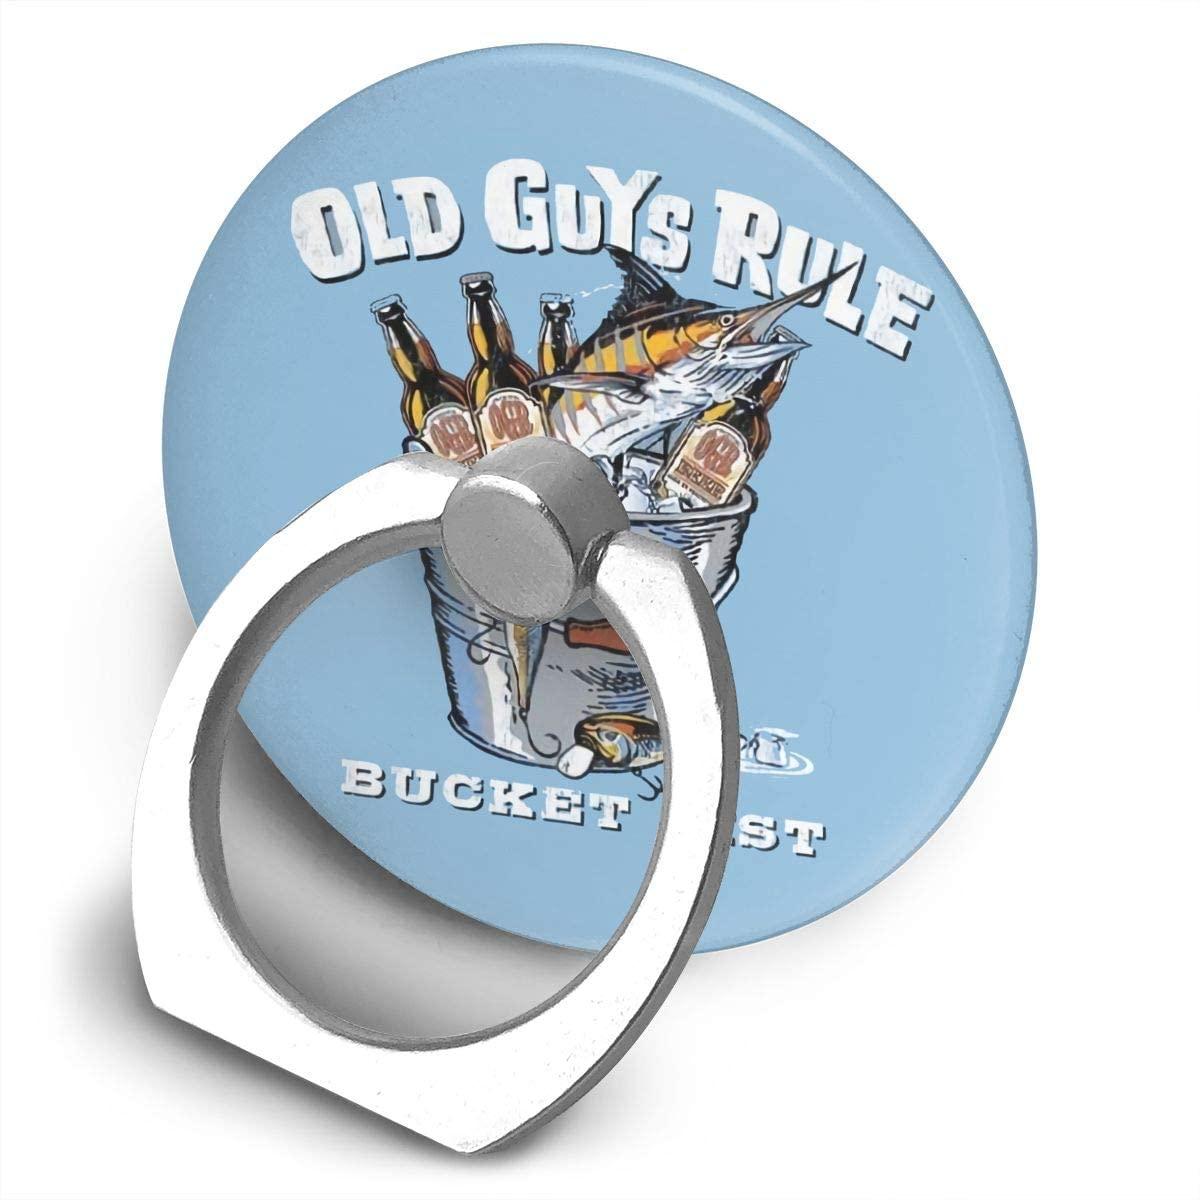 Levoncar Bucket List Alloy Mobile Phone Ring Bracket,360 Degree Rotating Ring Stand Grip Mounts